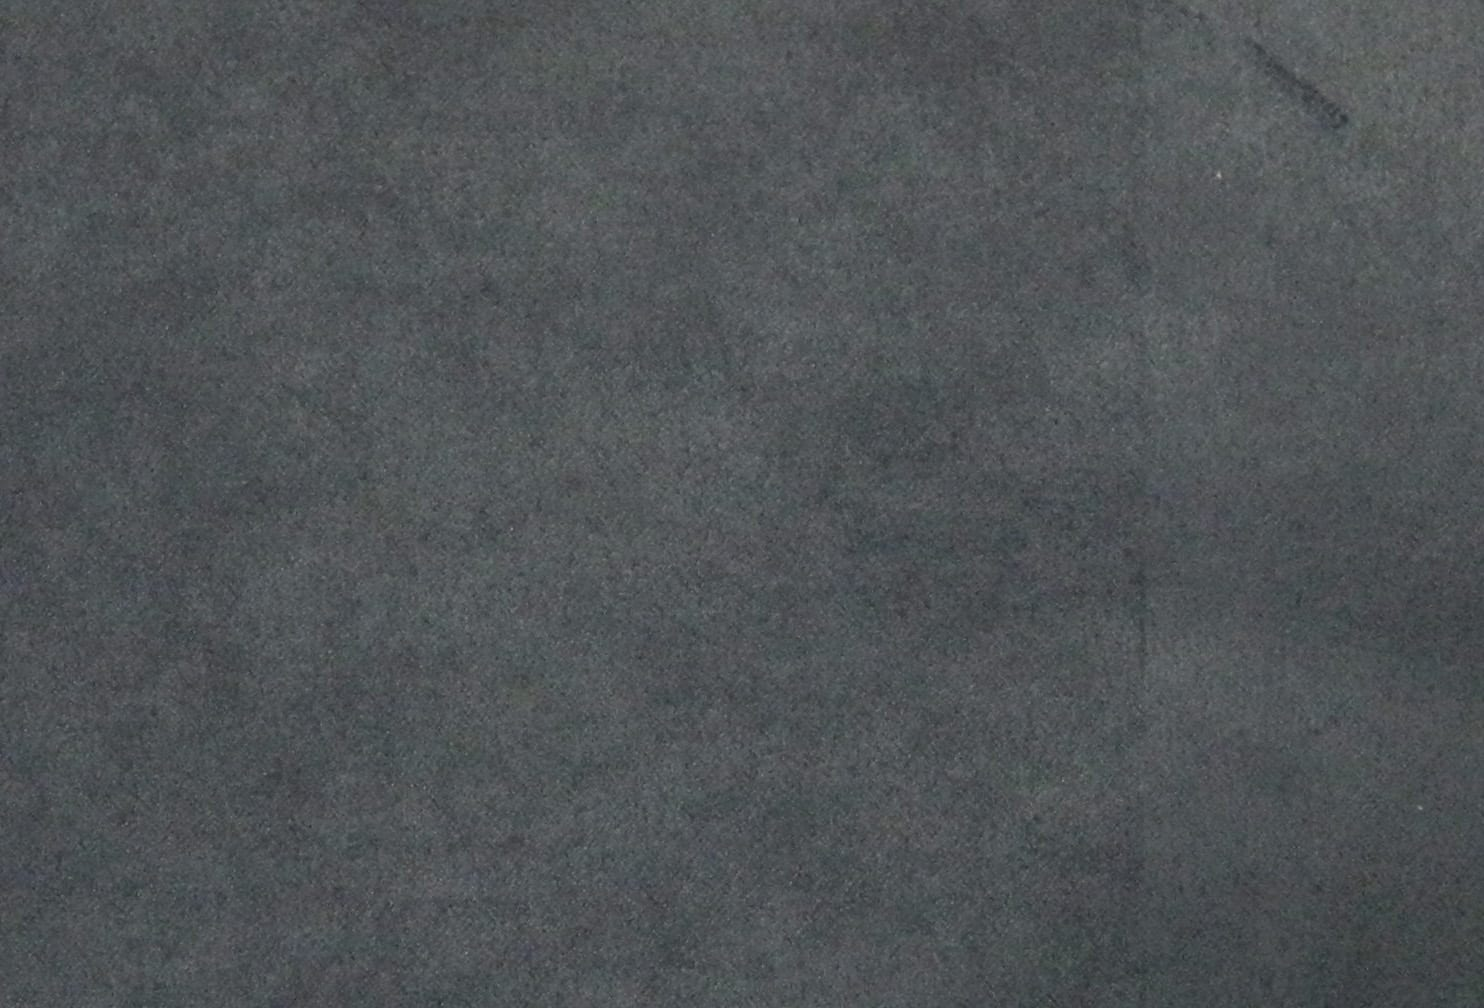 Suede Upholstery Fabric >> Suede Fabrics | Equus Fabrics